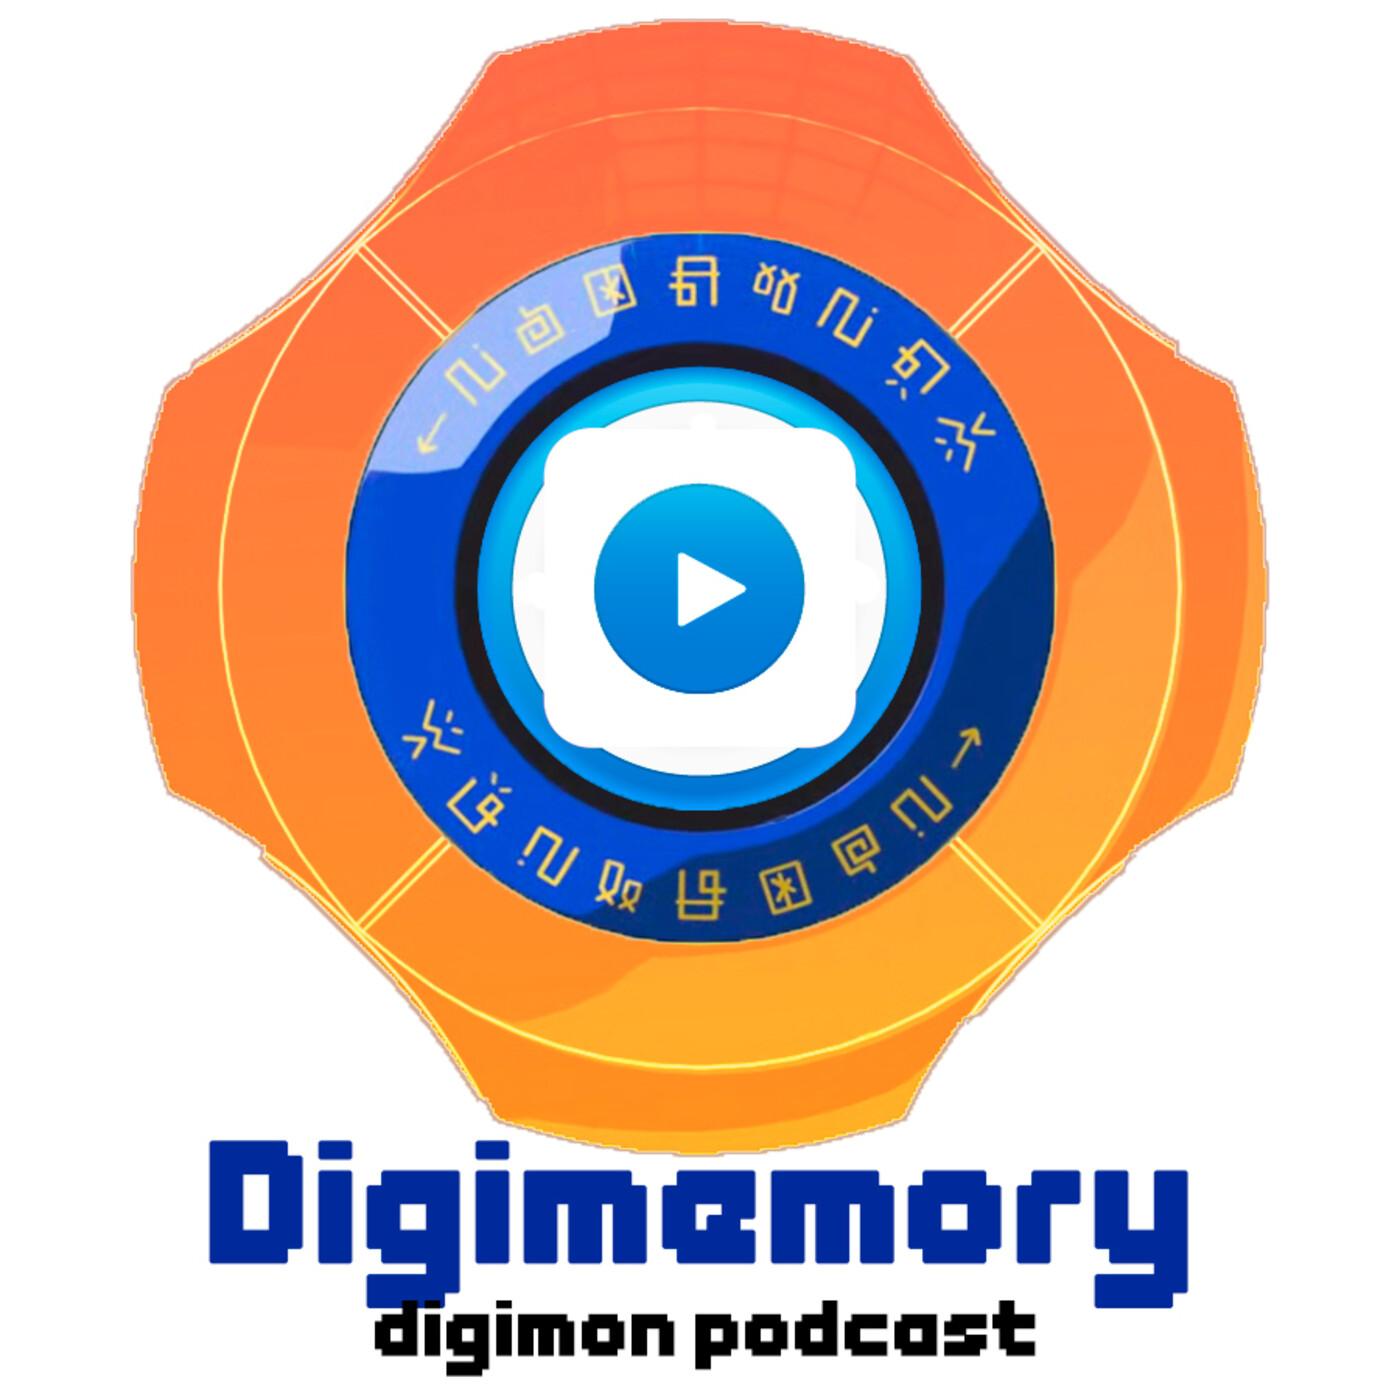 Digimemory - #03